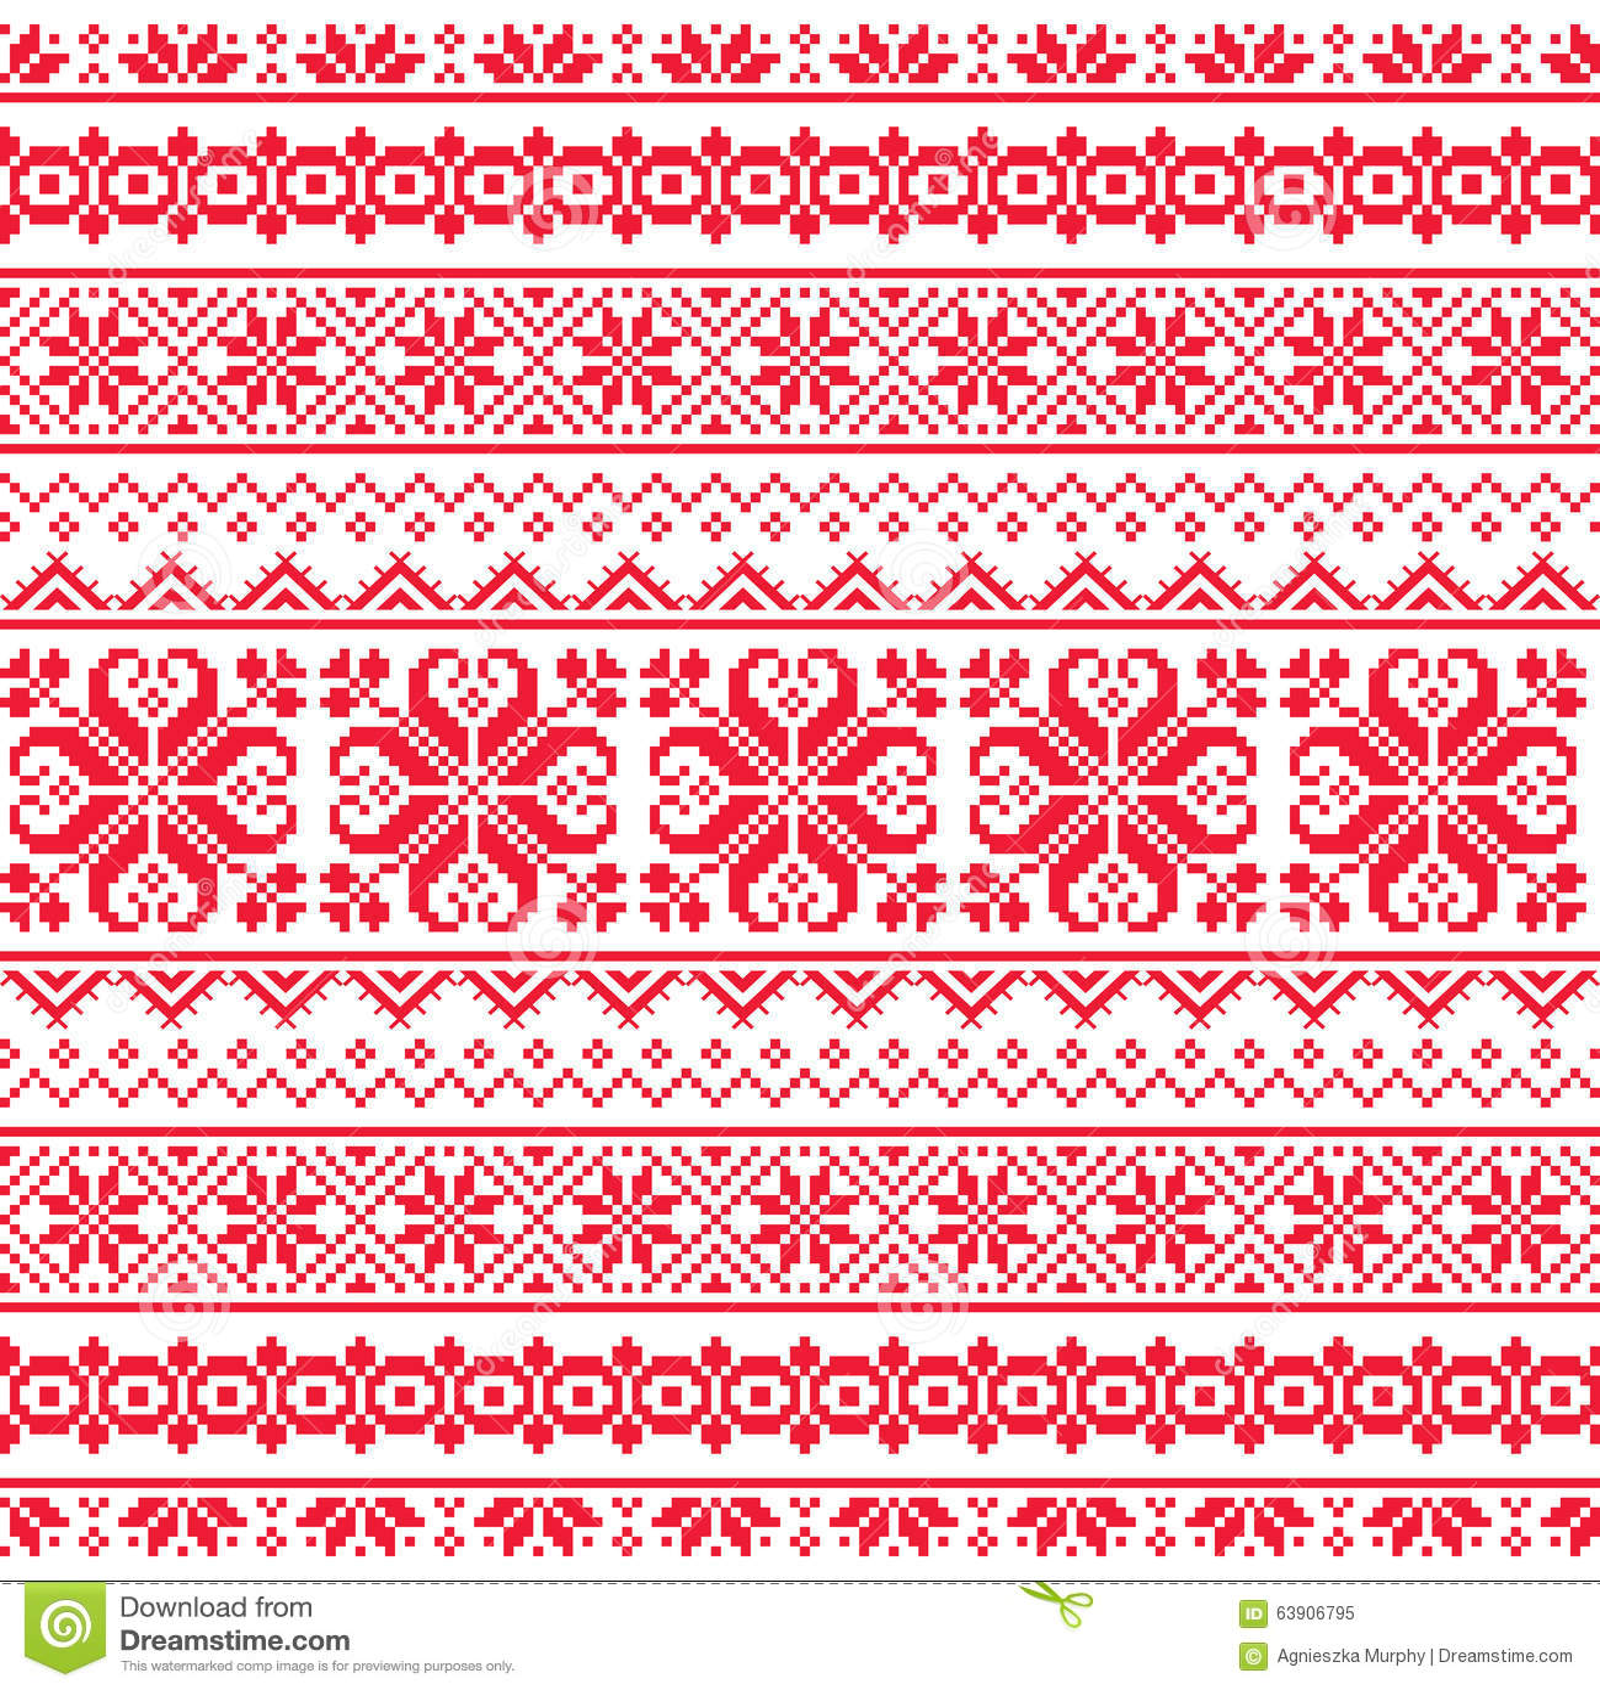 Ukrainian belarusian red embroidery seamless pattern